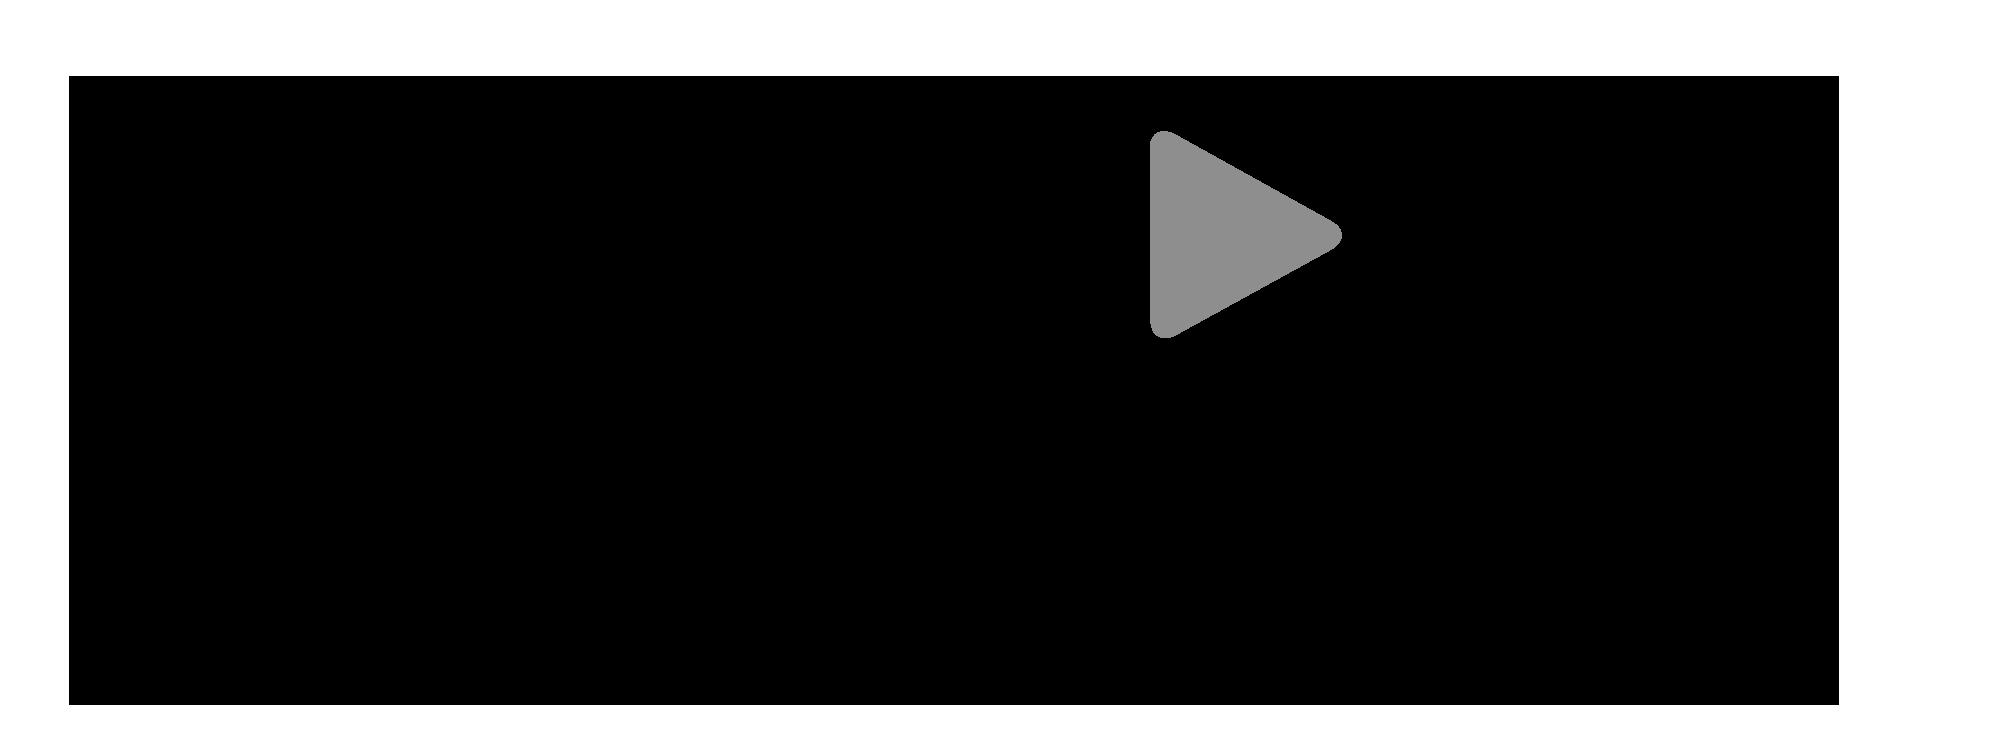 video-stewards-logo.png